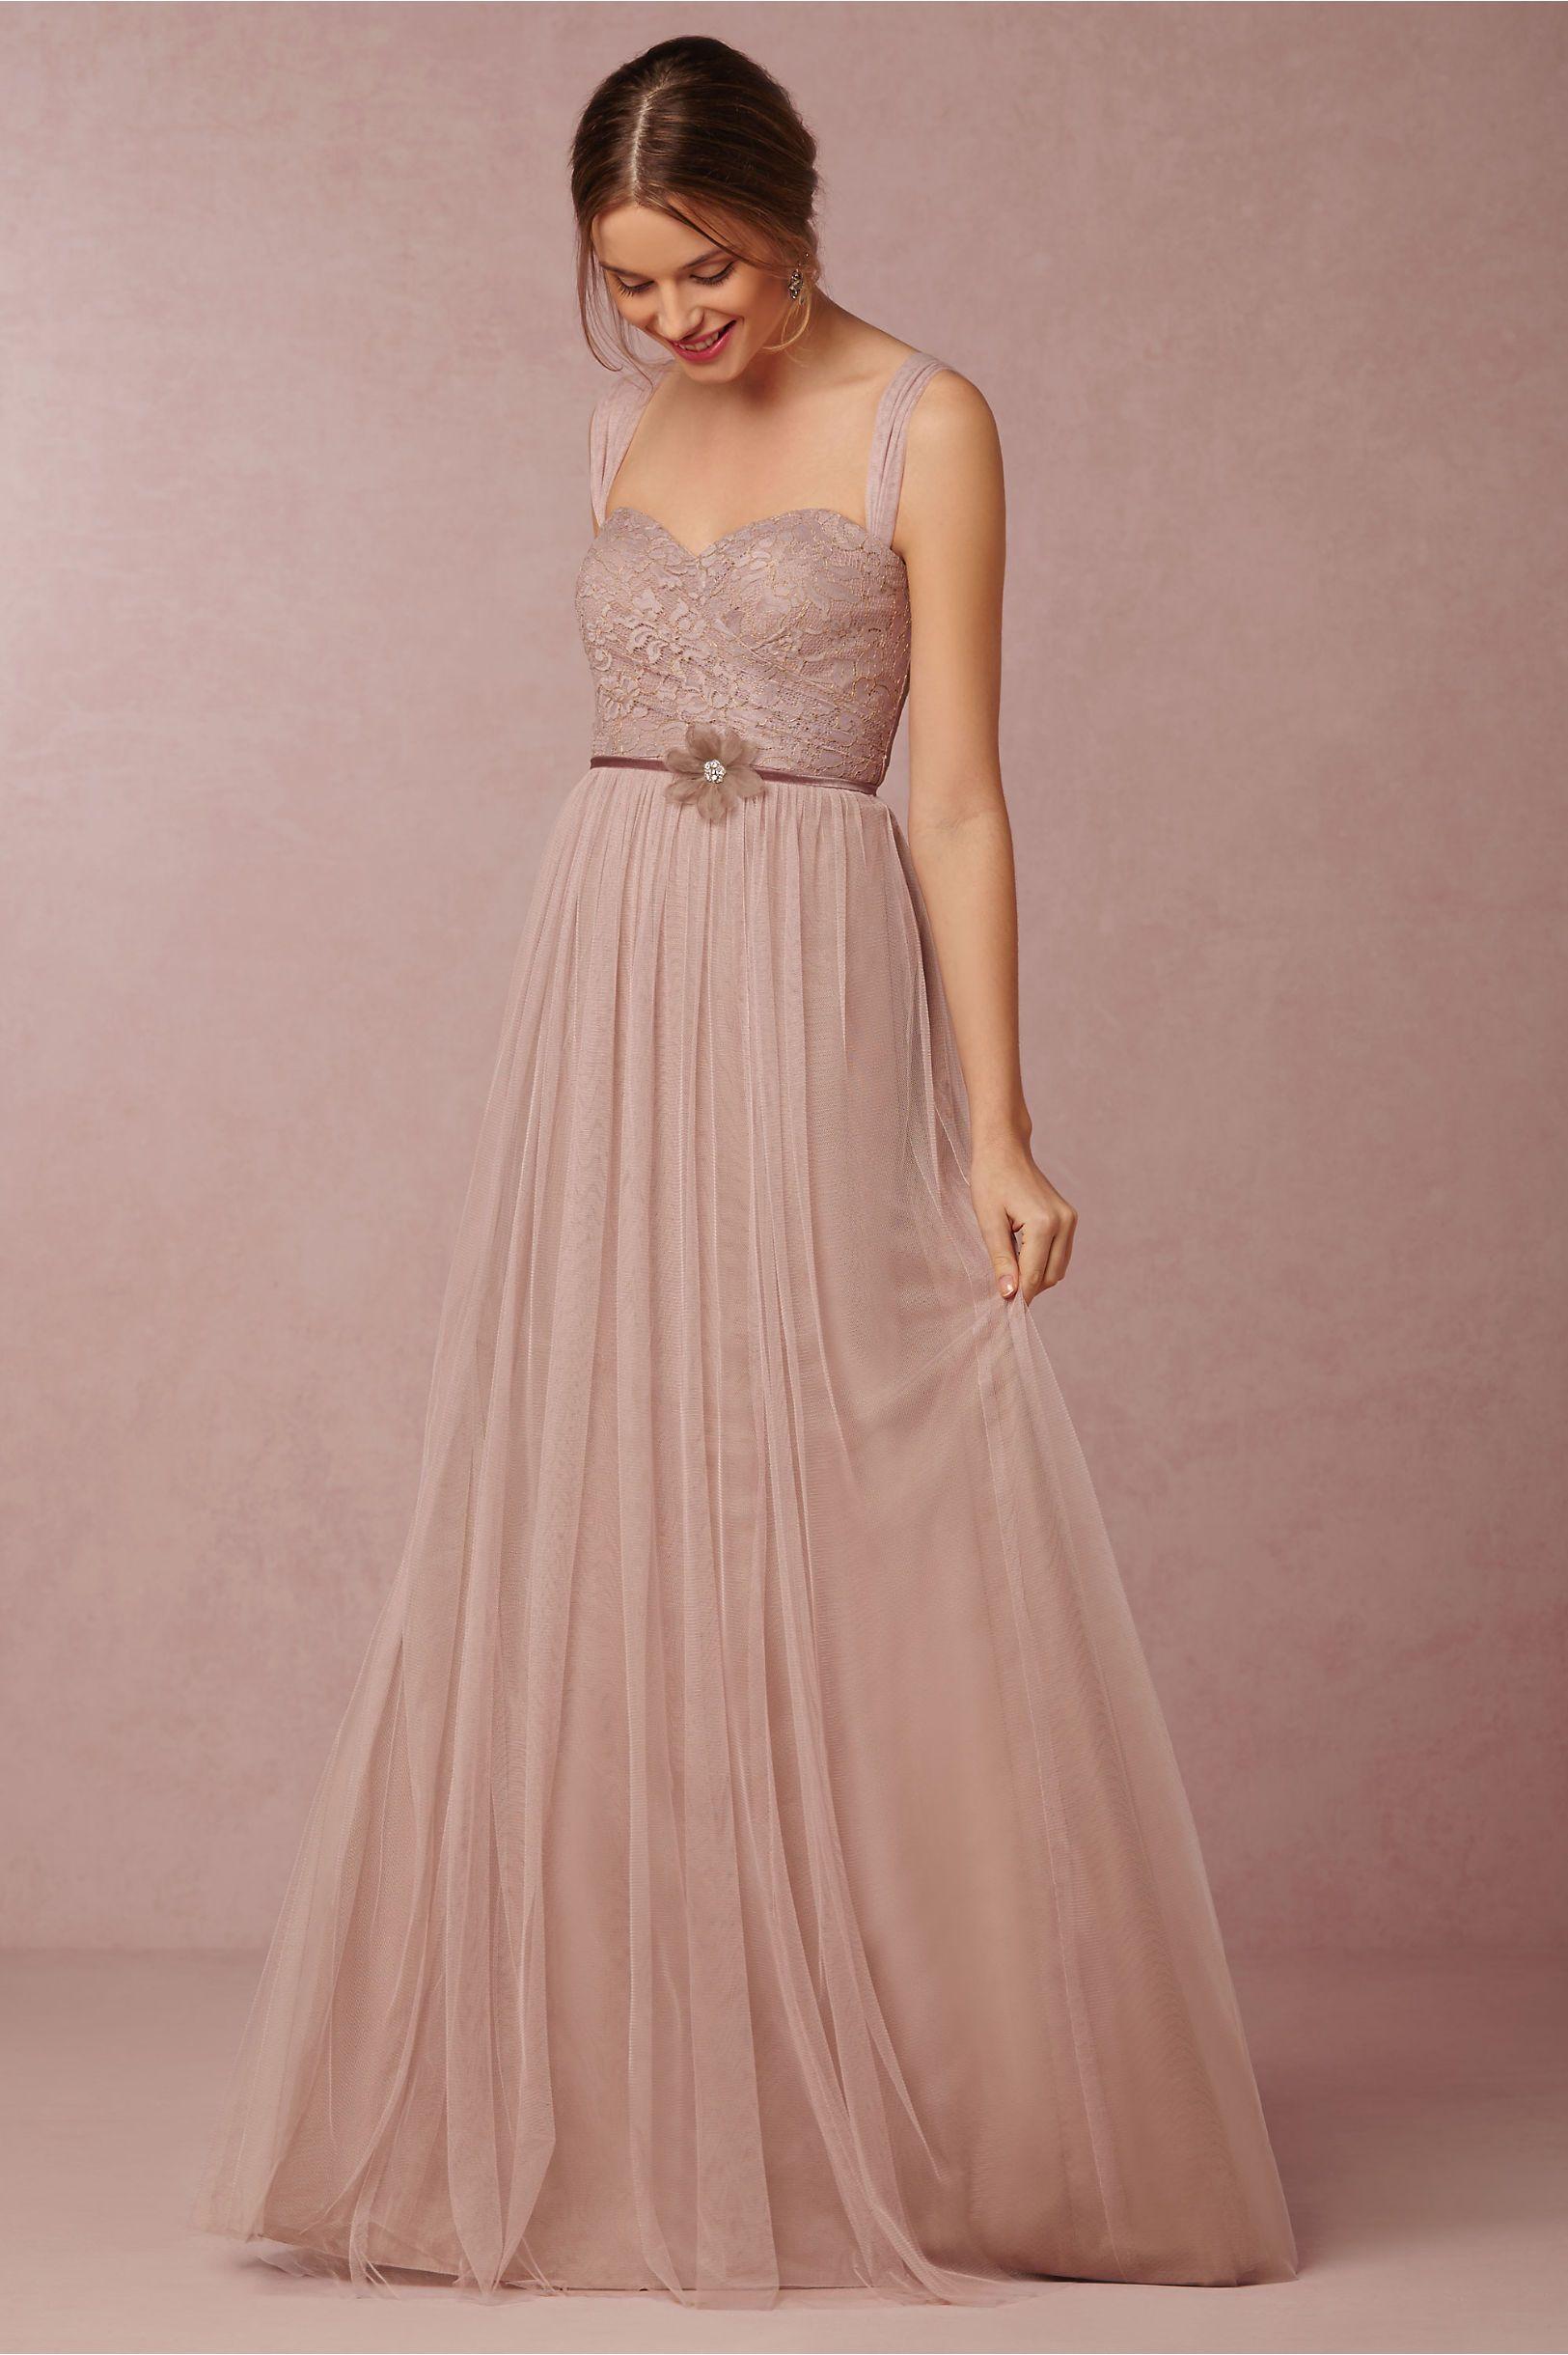 Shades of Mauve, Blush & Turquoise} Wedding Color Inspiration | La ...